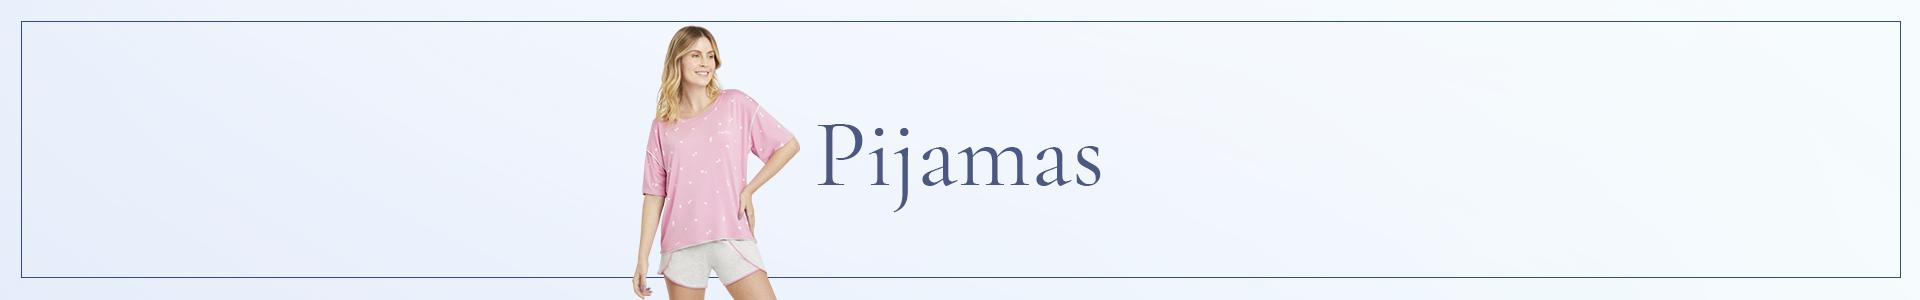 Banner Pijamas